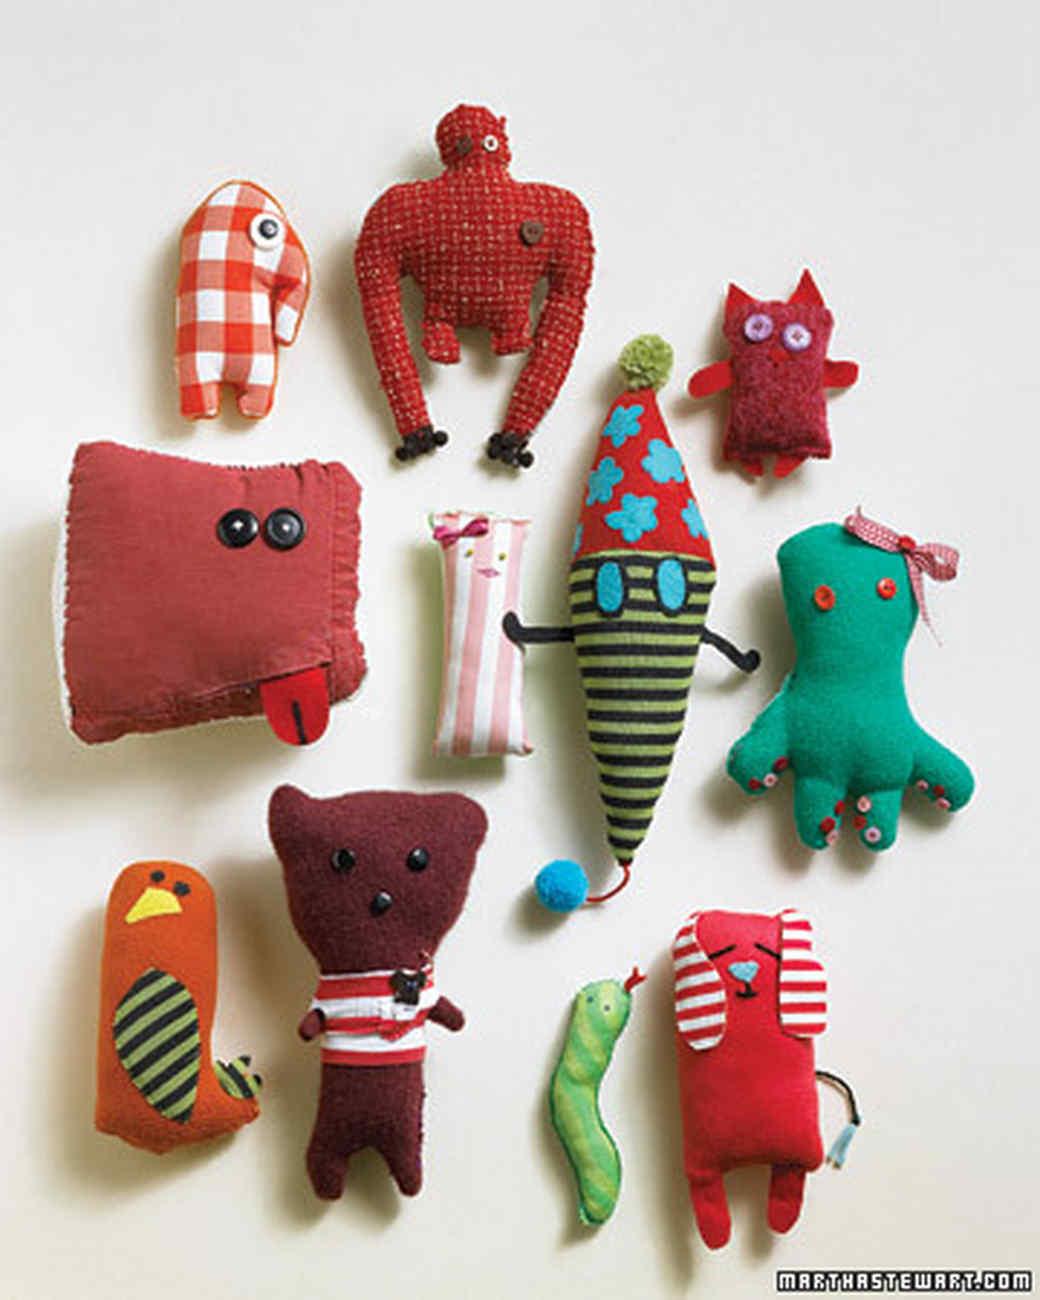 Handmade Craft Ideas For Kids Part - 16: Stuffed Animals From Kidsu0027 Drawings